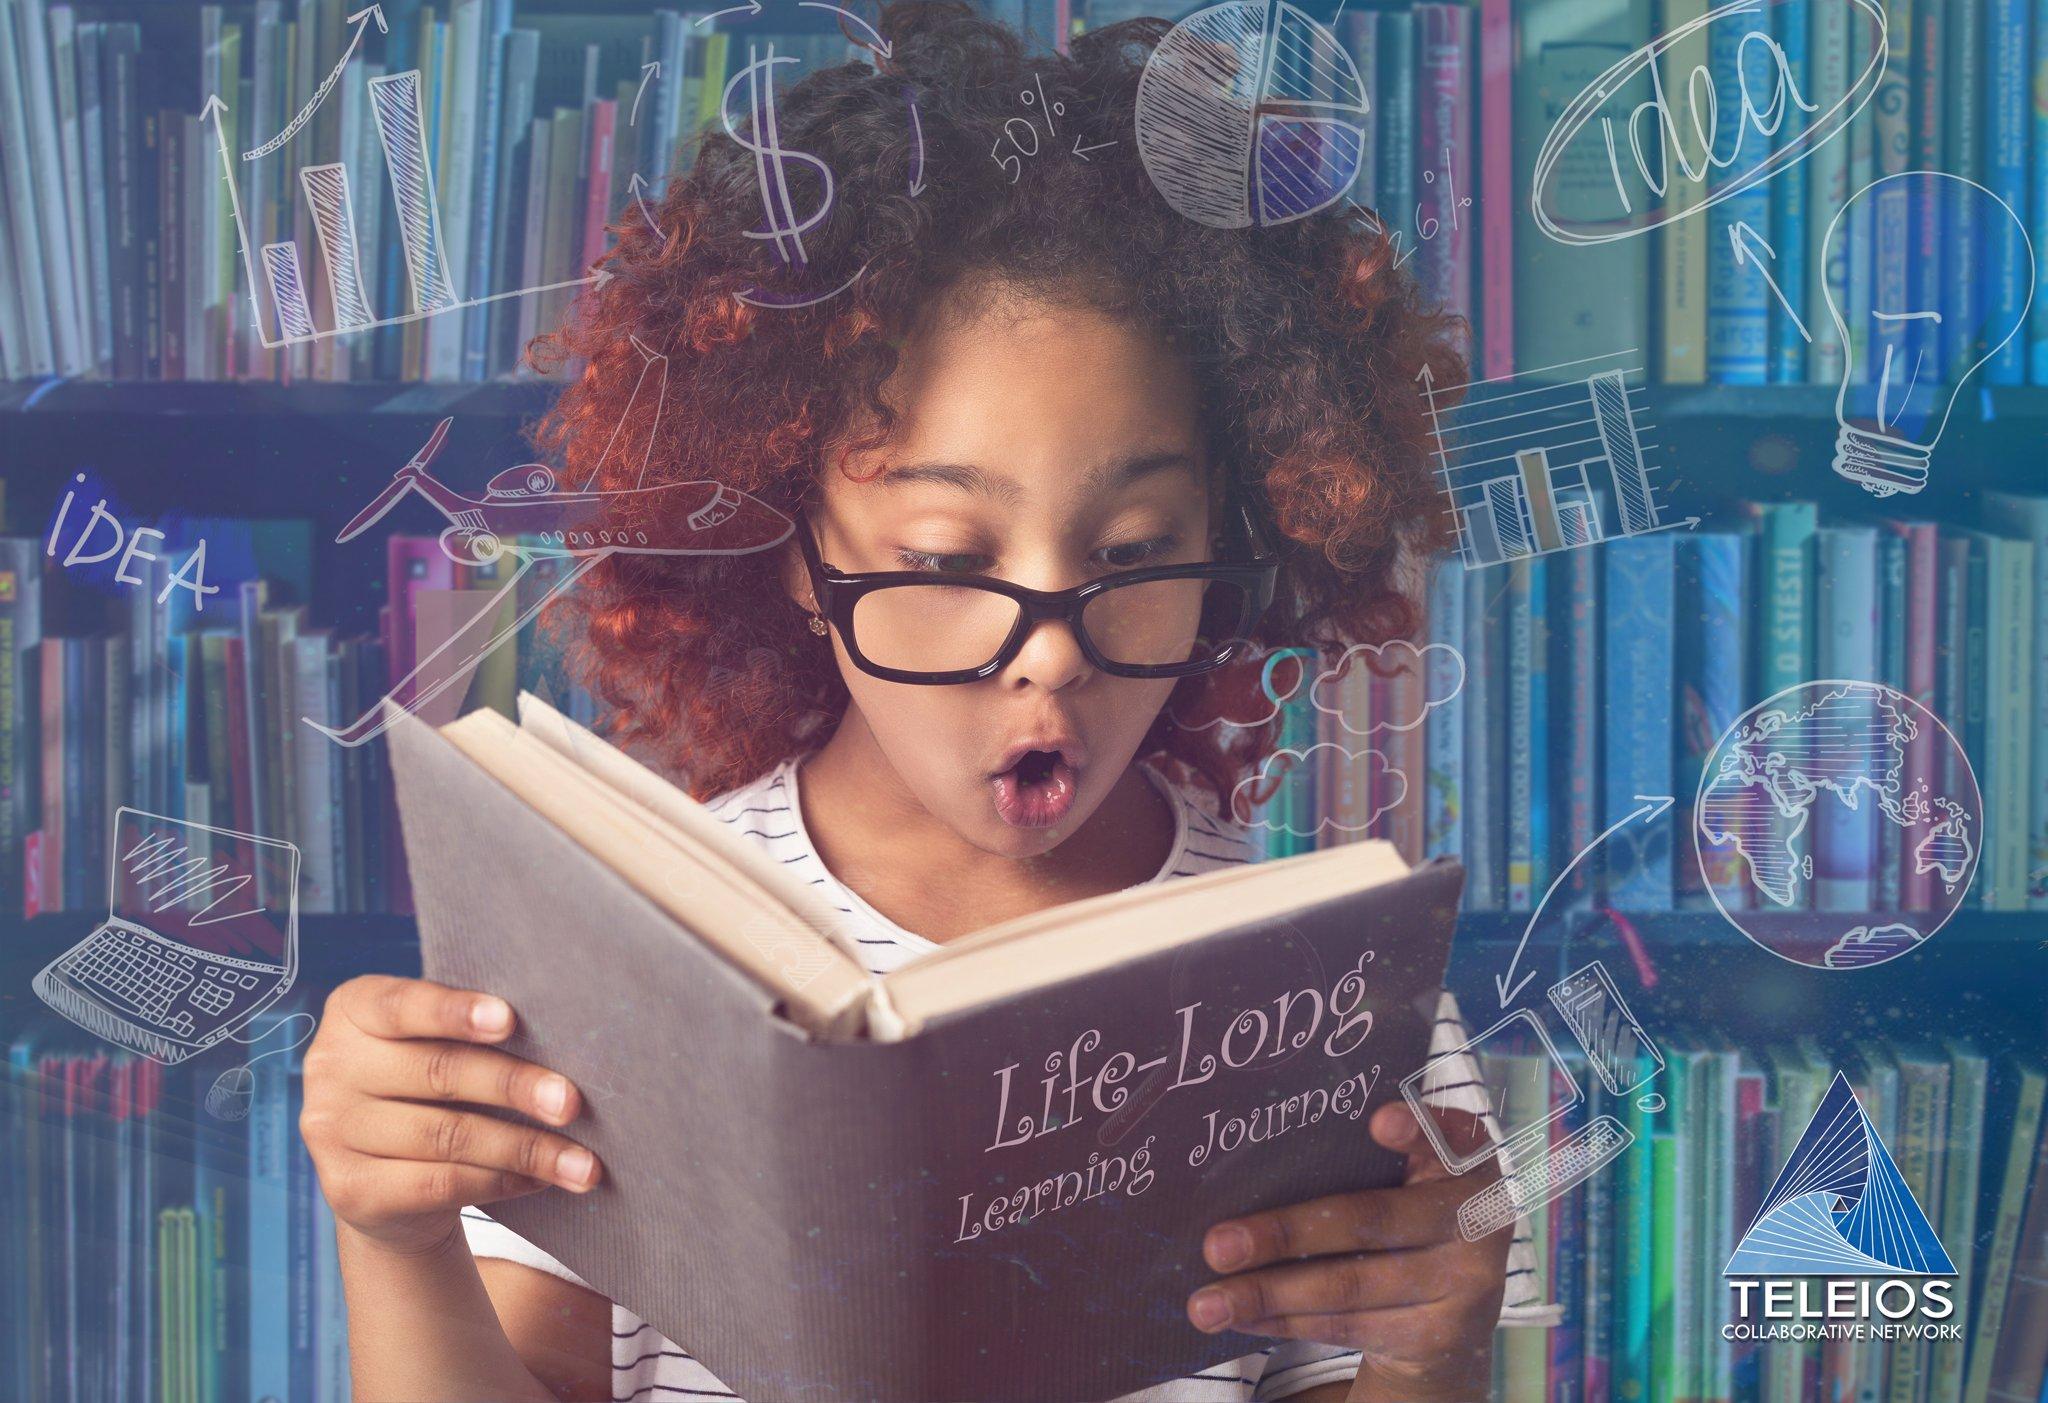 life-long-learning-journey-blog